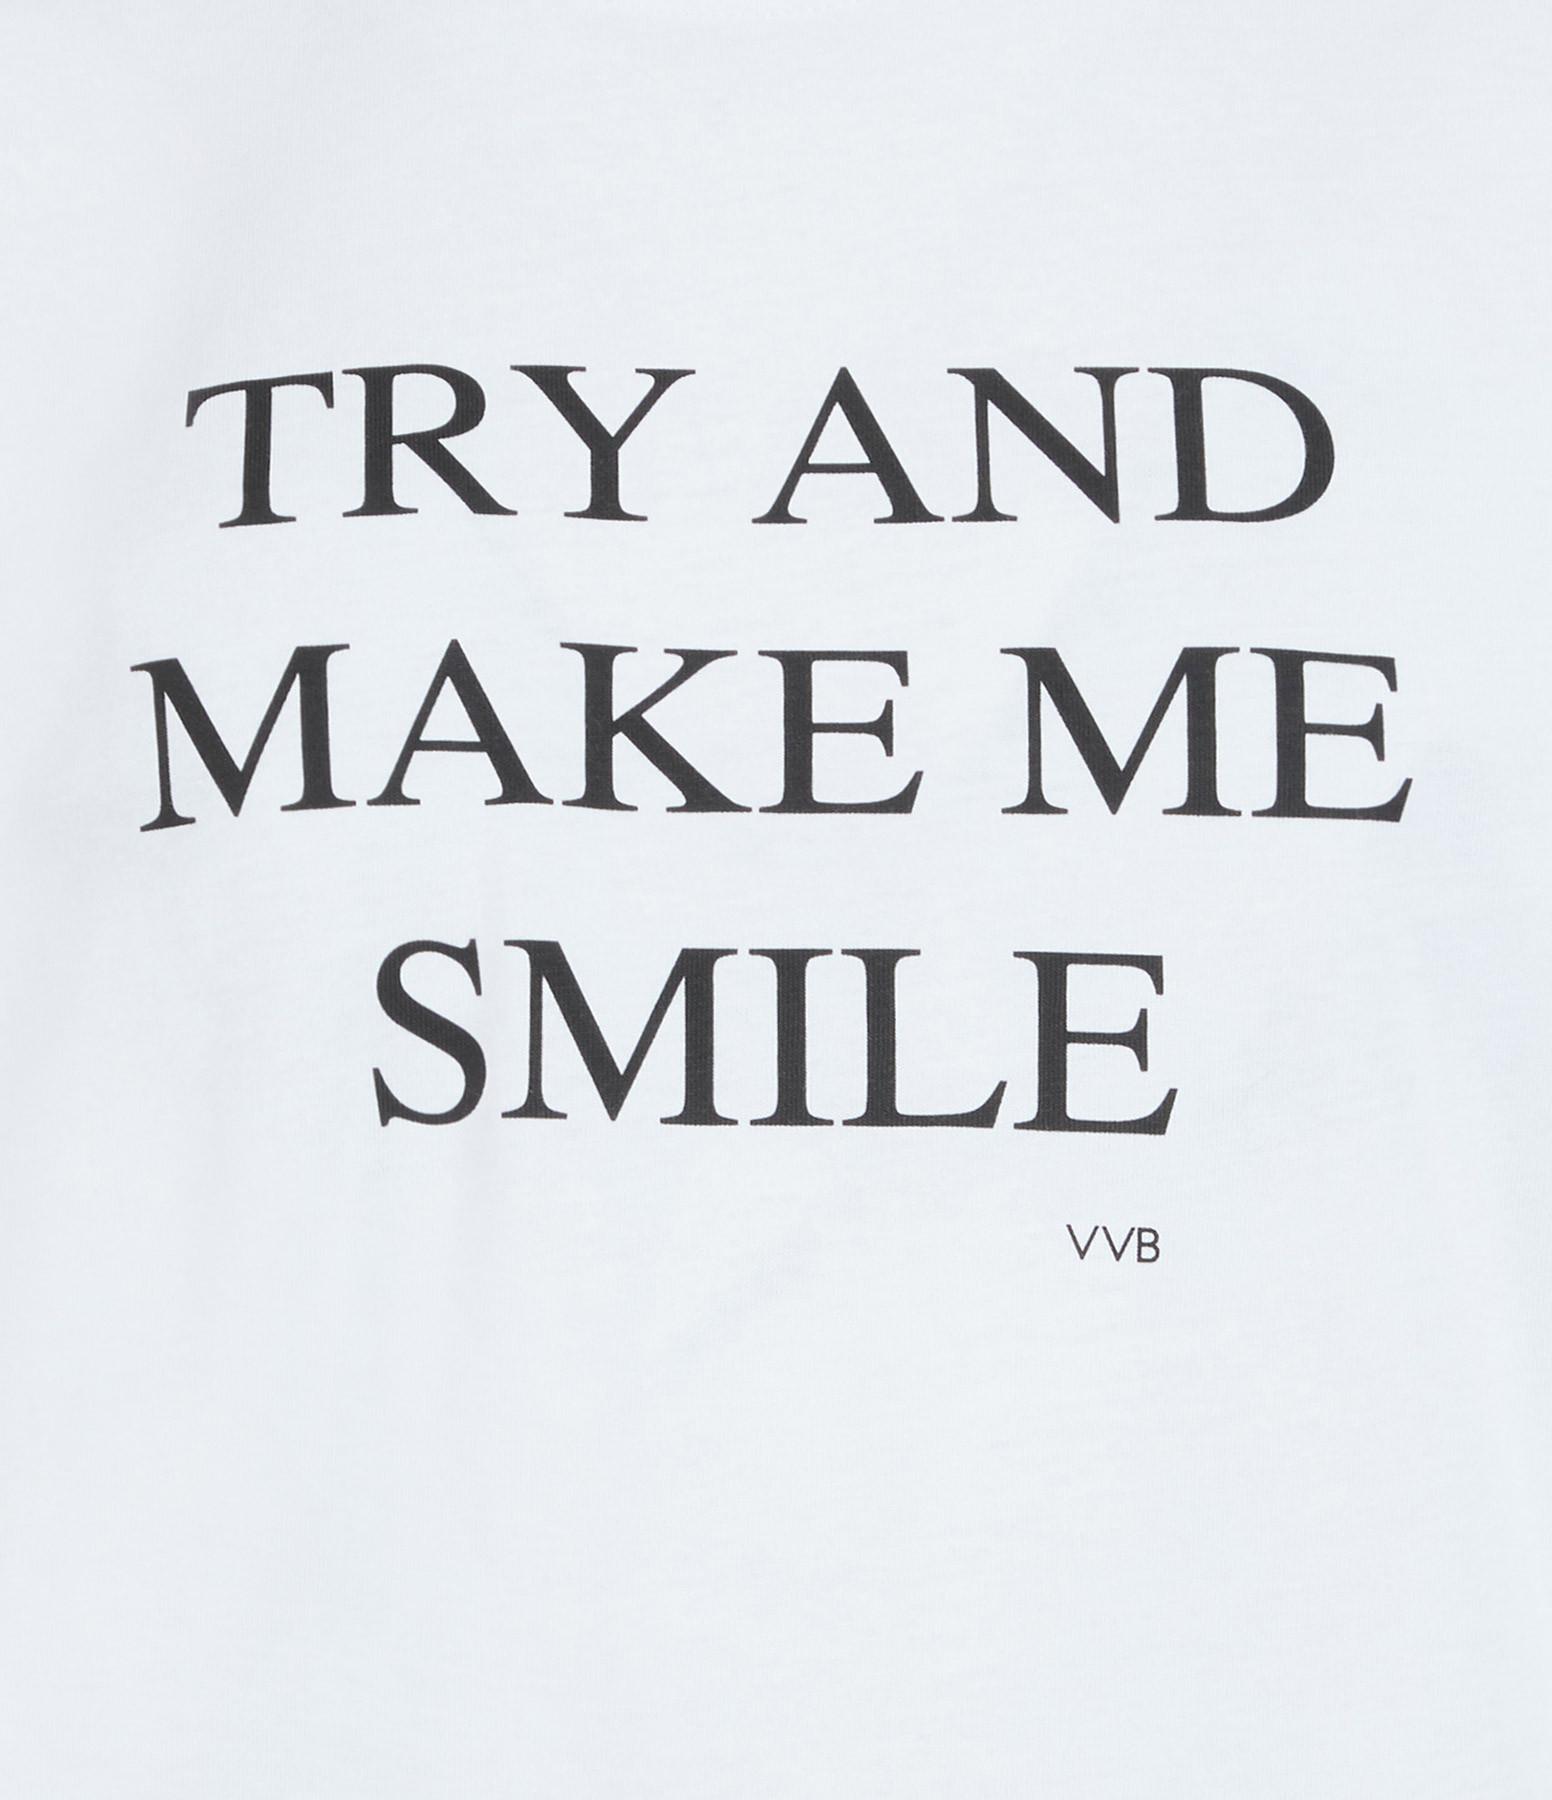 VICTORIA VICTORIA BECKHAM - Tee-shirt Try and Make Me Smile Blanc